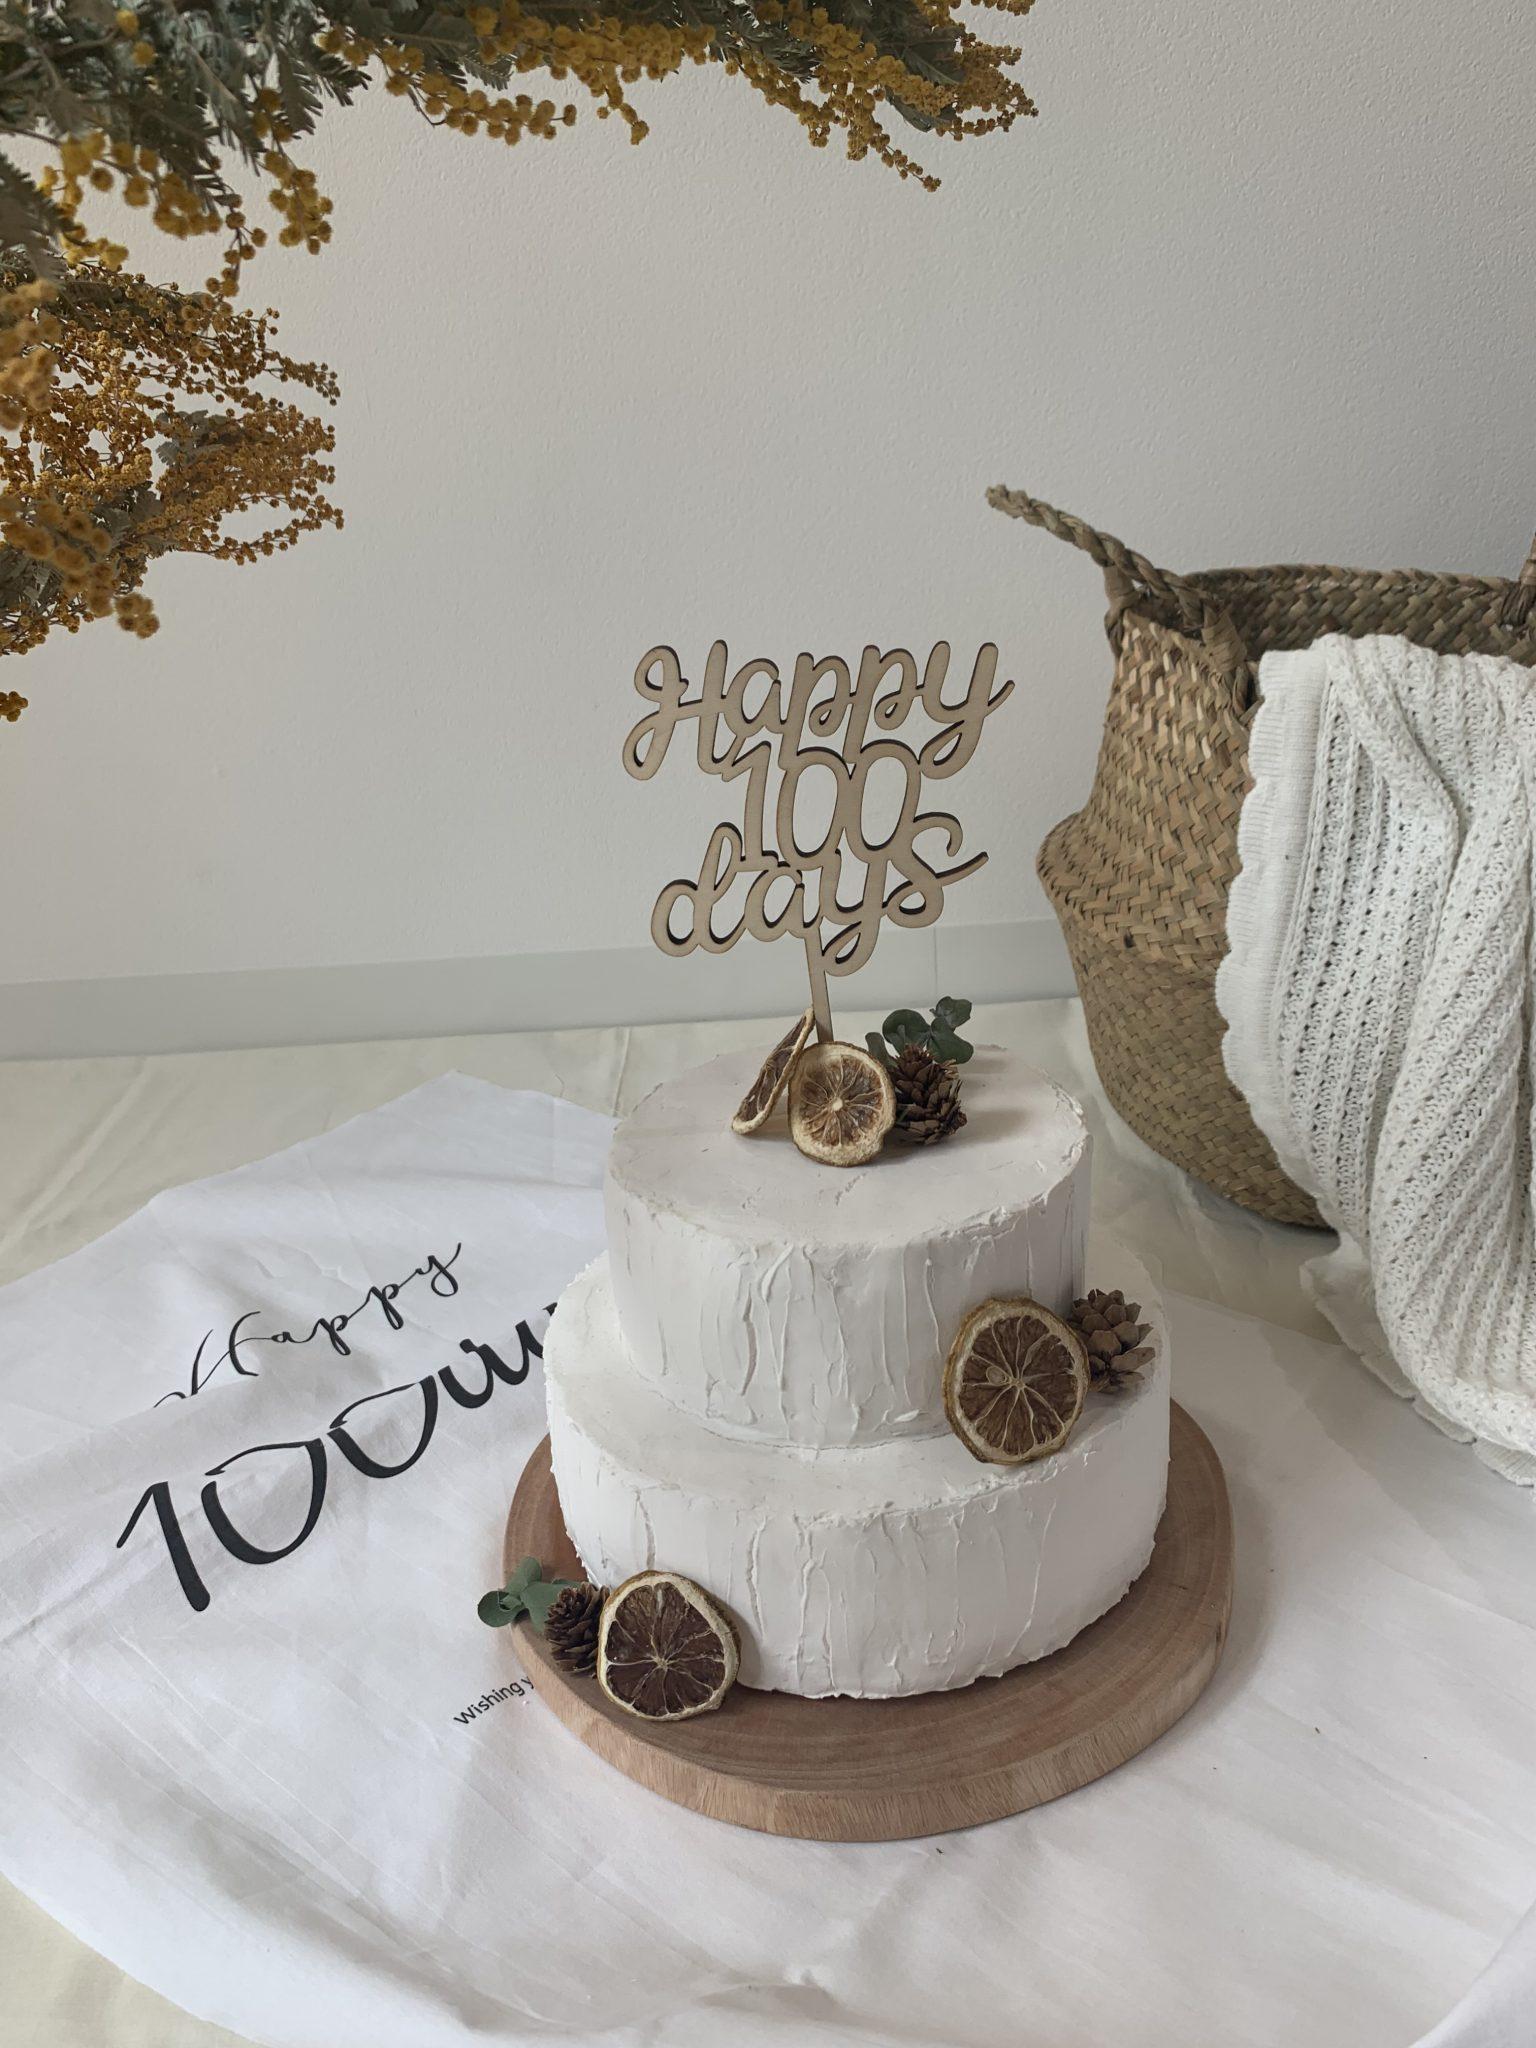 Happy100days ケーキトッパー